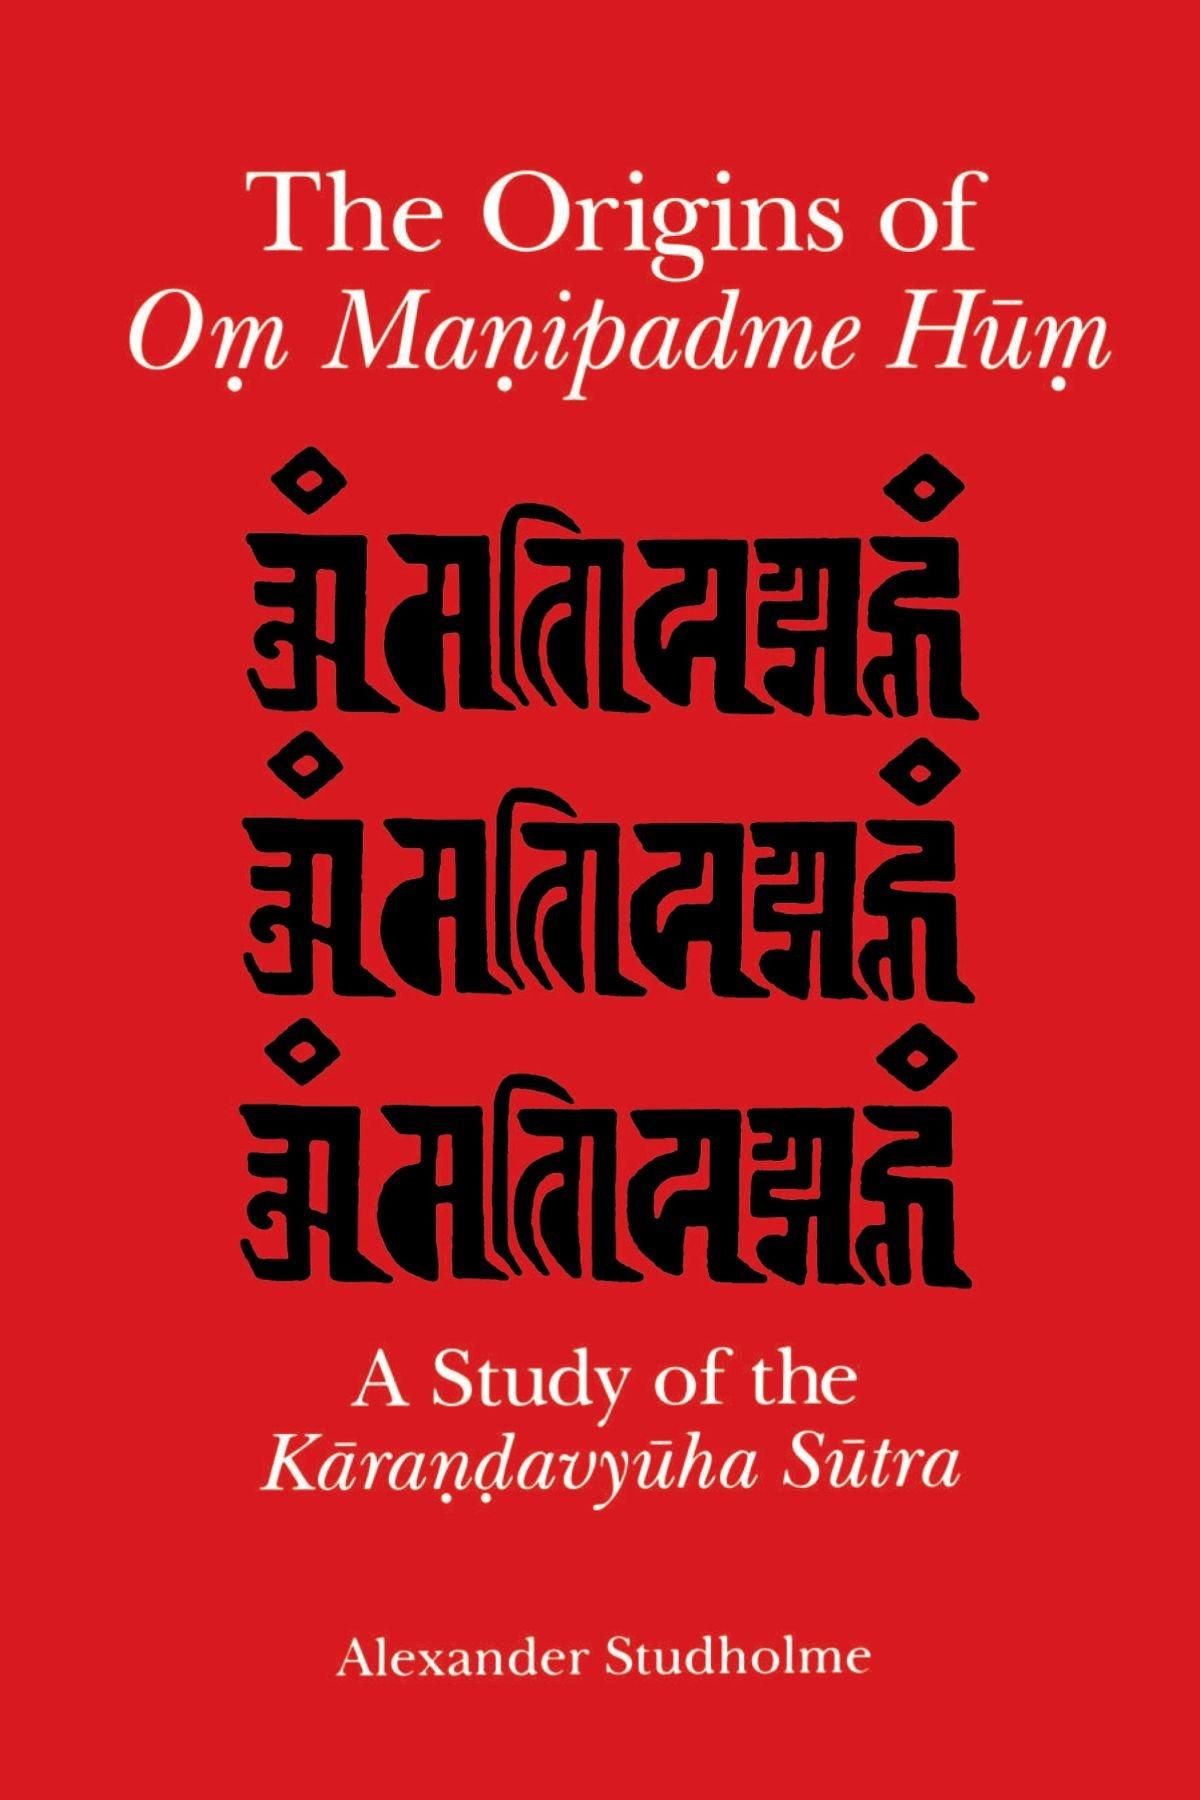 The Origins of Om Manipadme Hum: A Study of the Karandavyuha Sutra